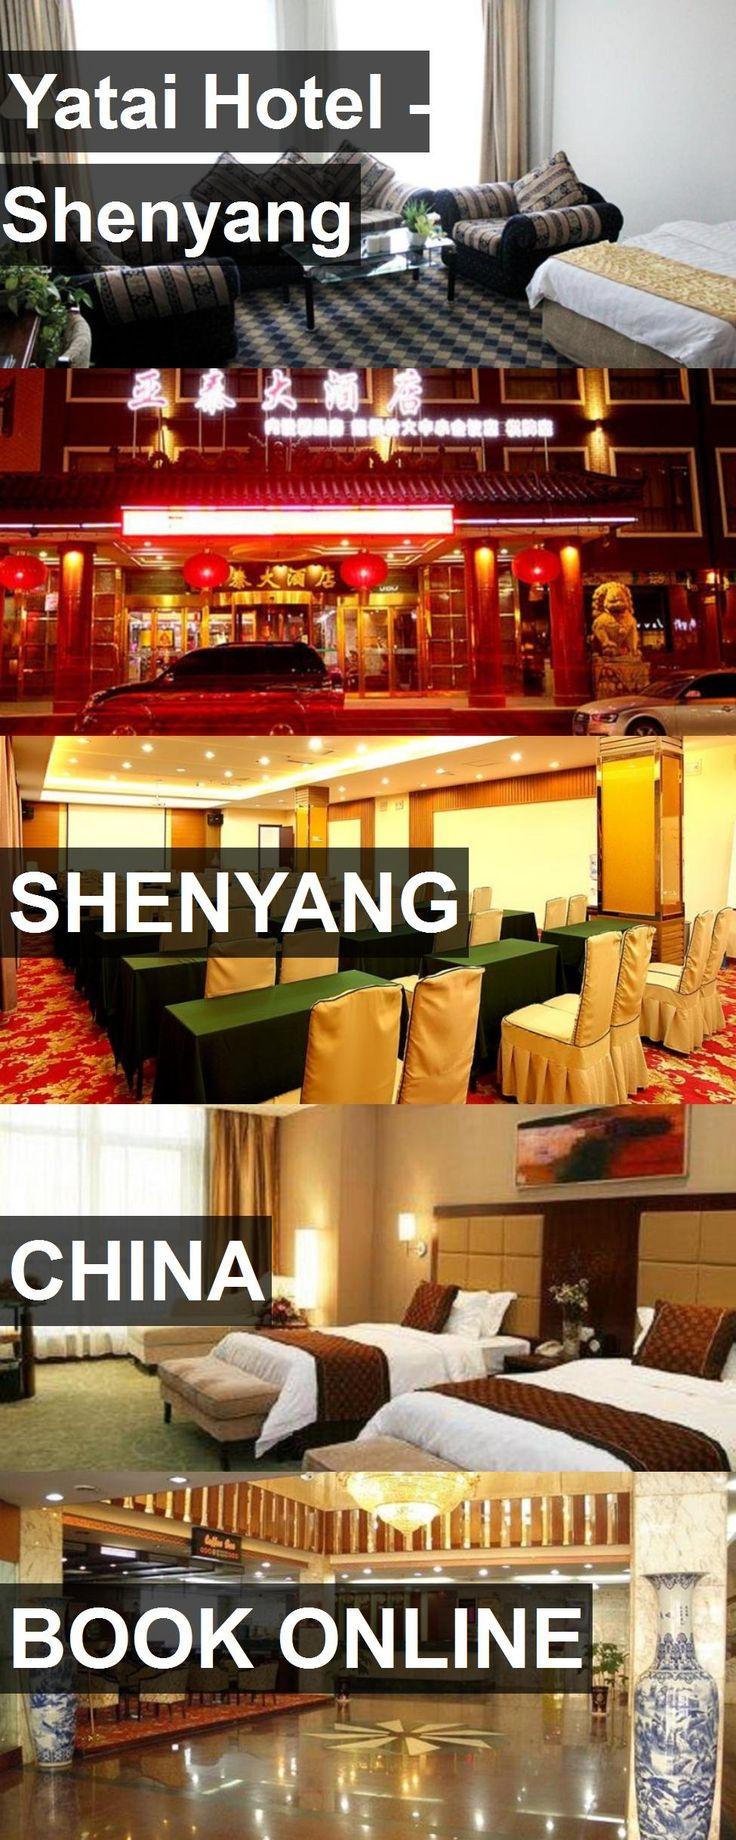 Hotel Yatai Hotel - Shenyang in Shenyang, China. For more information, photos, reviews and best prices please follow the link. #China #Shenyang #YataiHotel-Shenyang #hotel #travel #vacation